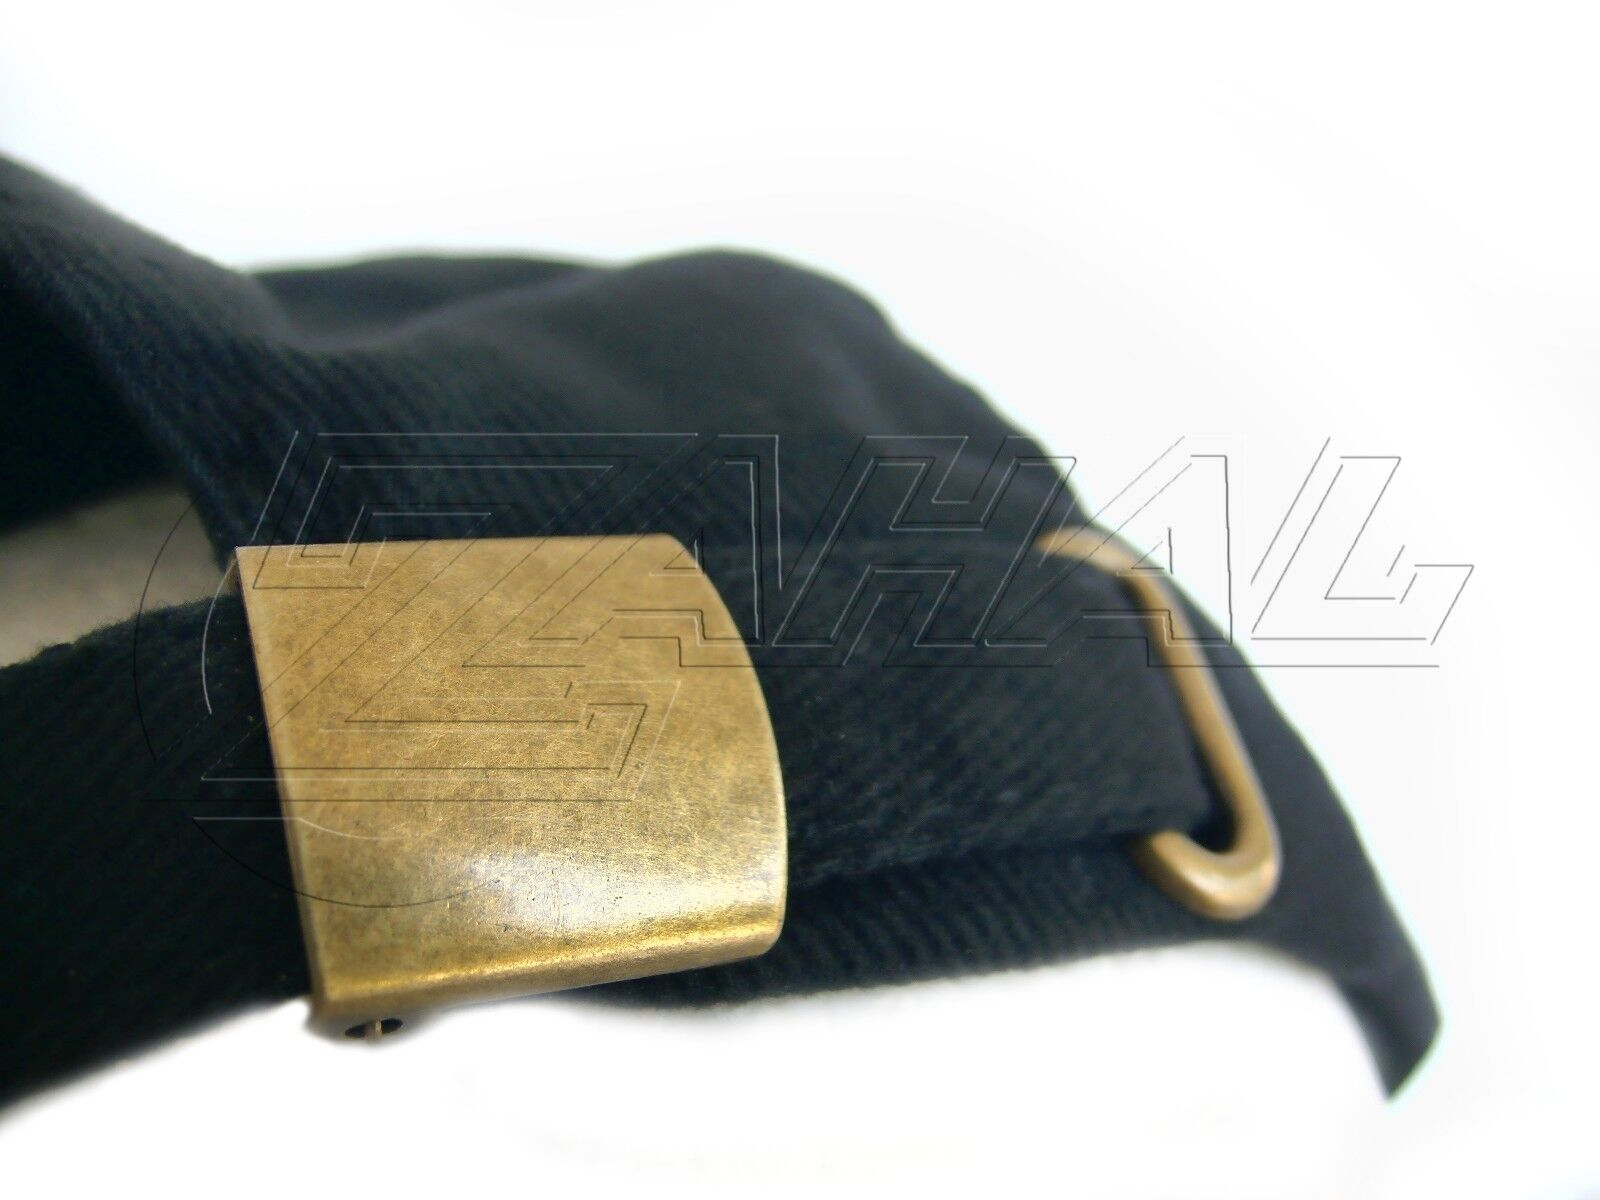 858 Exclusive BLACK Ball Cap By Zahal VZ58 Ballcap BLK Cz Vz 58